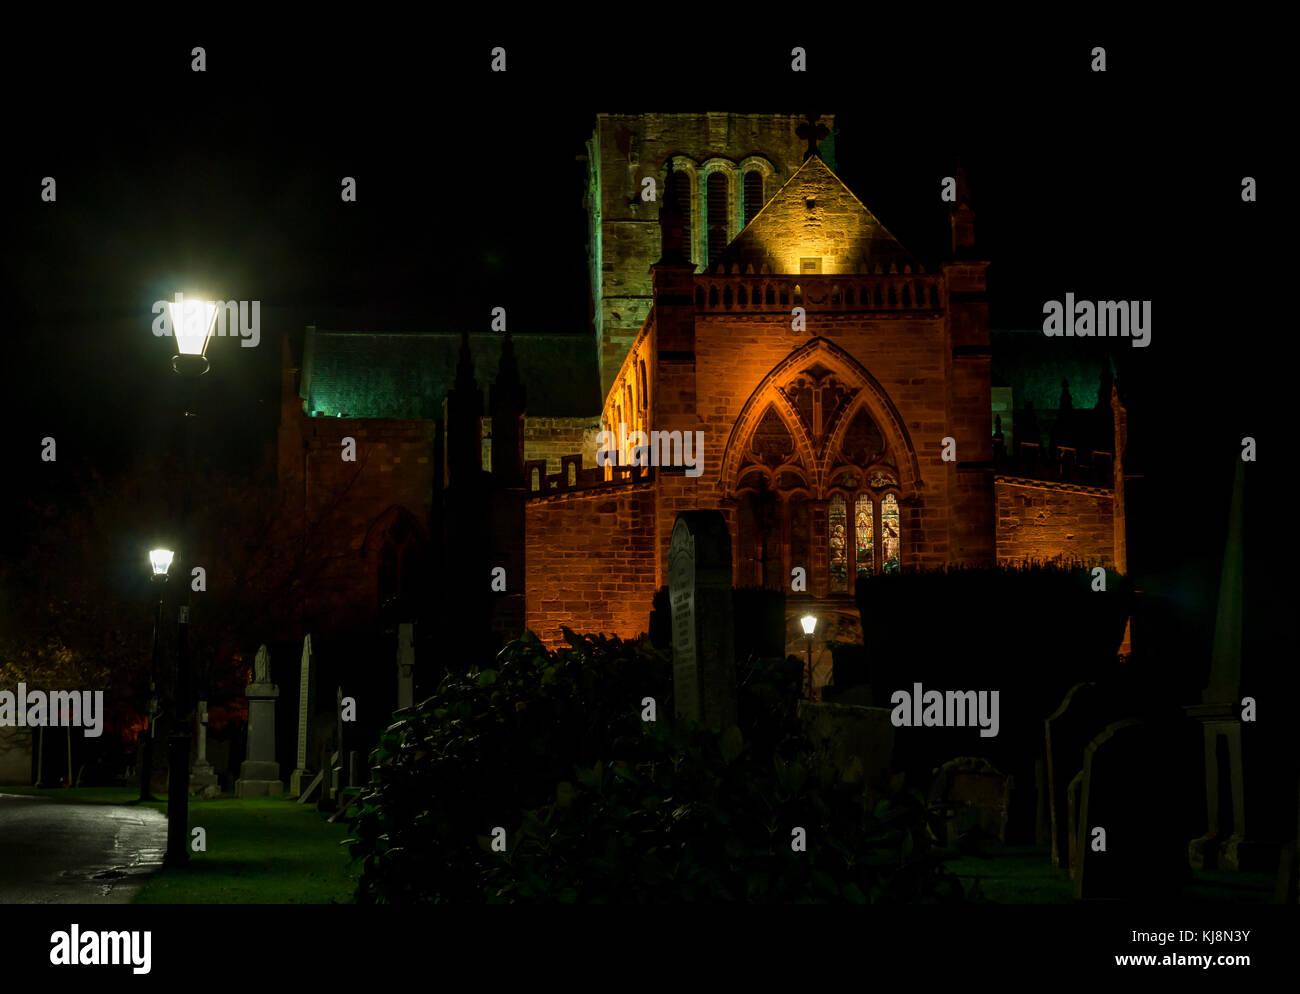 st-marys-collegiate-church-haddington-ea